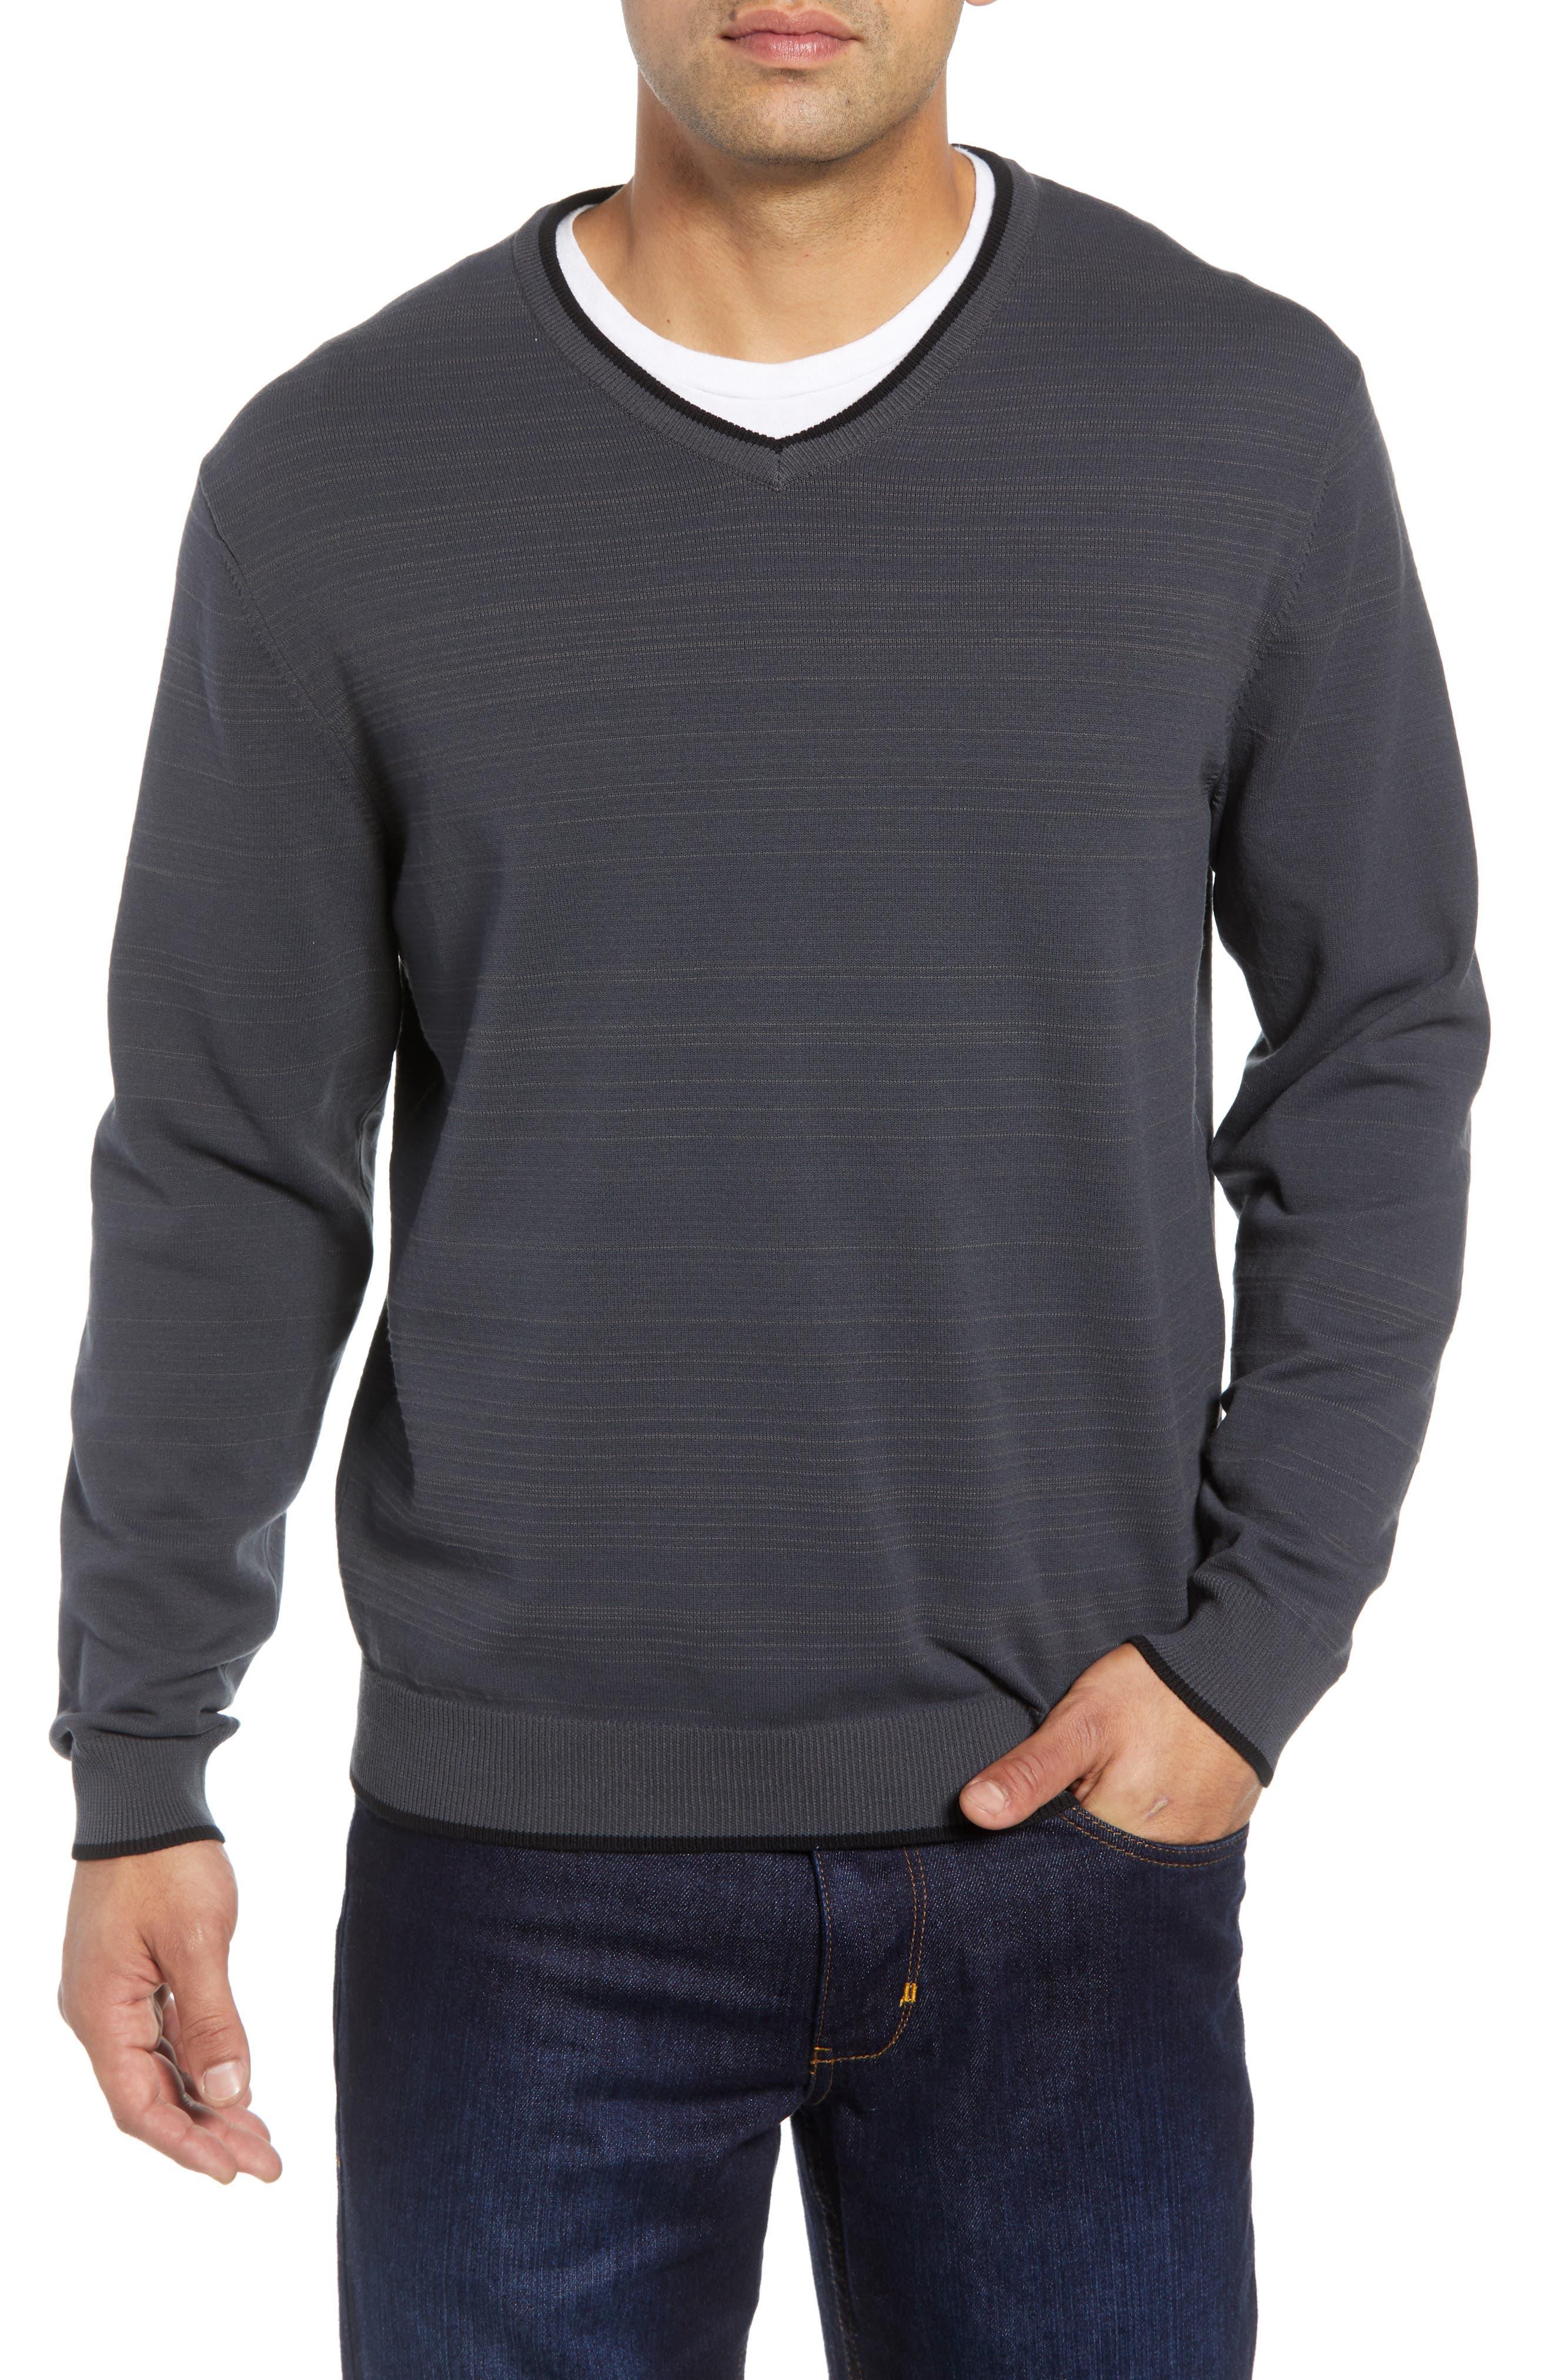 Cutter & Buck Impact V-Neck Sweater, Black